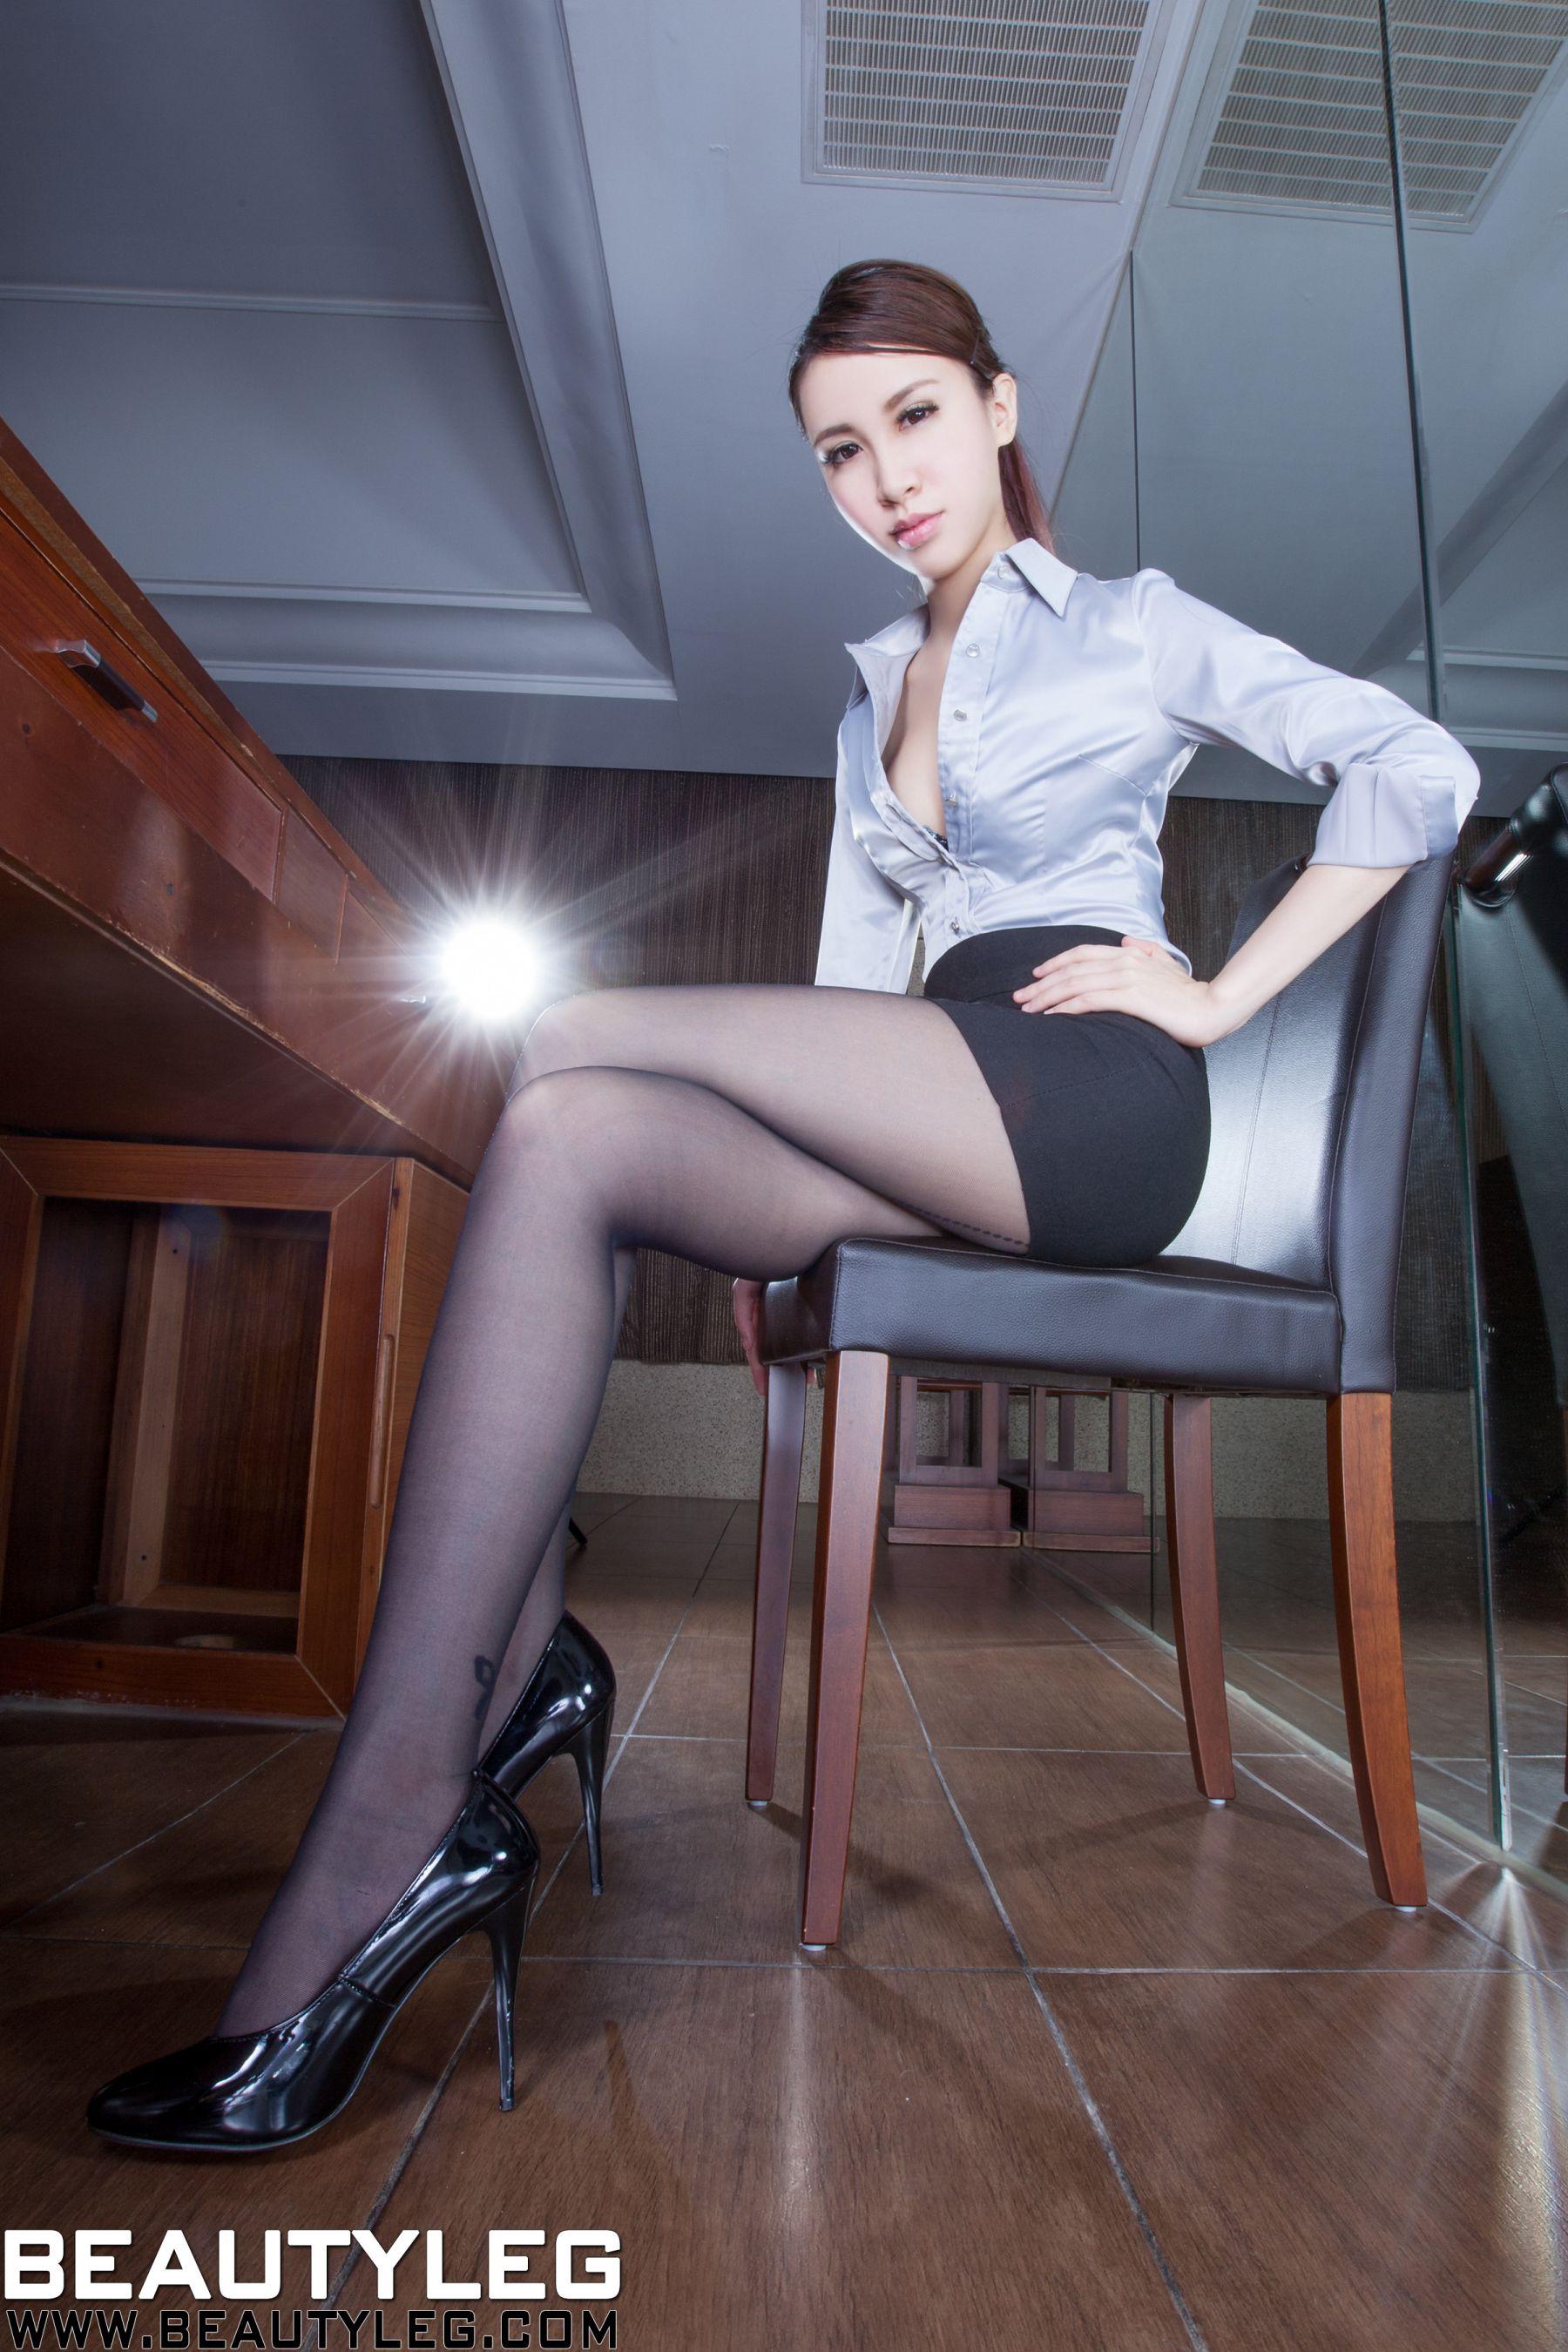 VOL.1005 [Beautyleg]办公室美腿黑丝:崔多朵(崔德蓉,腿模Stephy)高品质写真套图(50P)